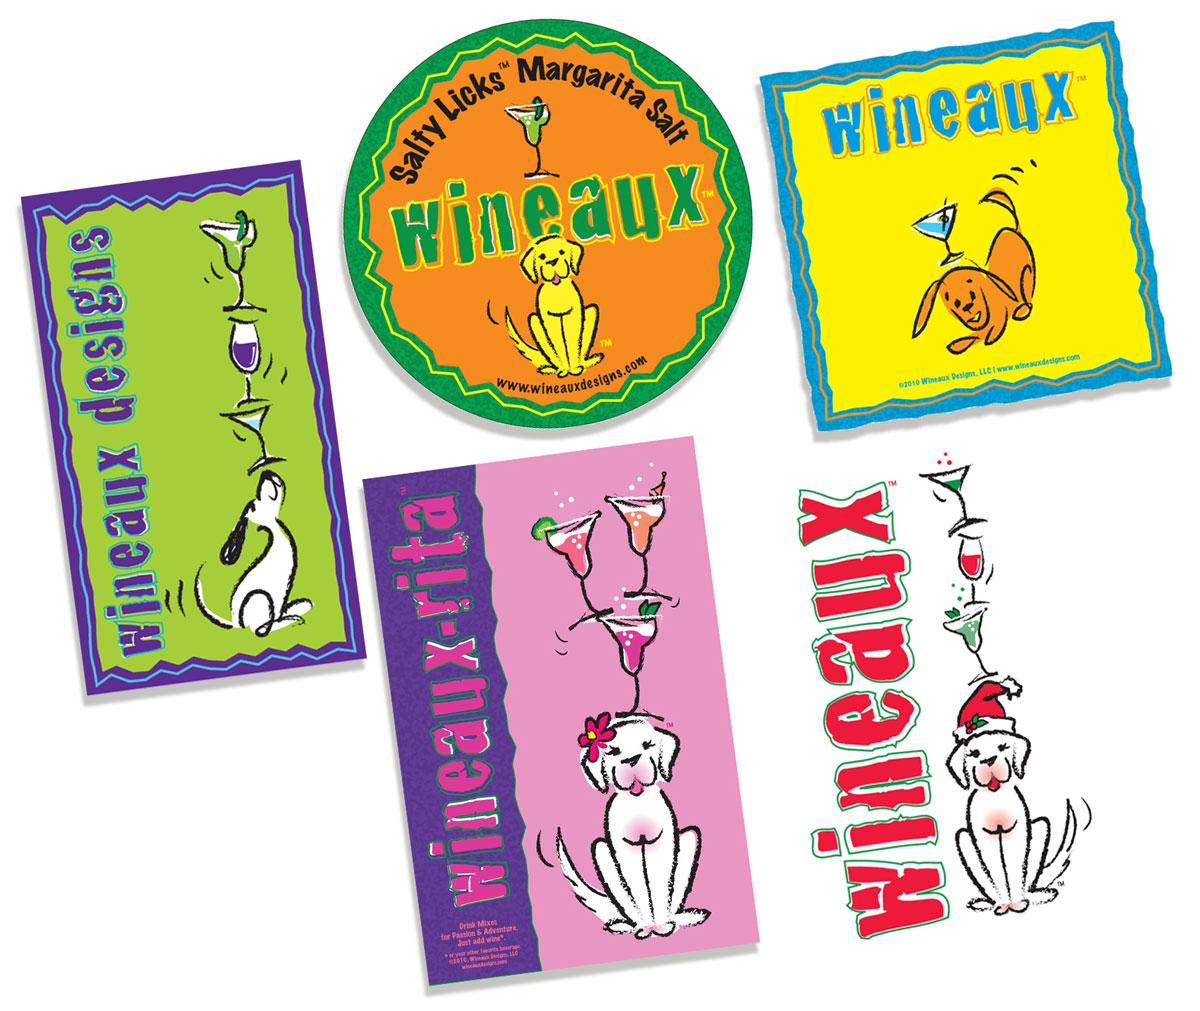 Wineaux, Illustrations, Design